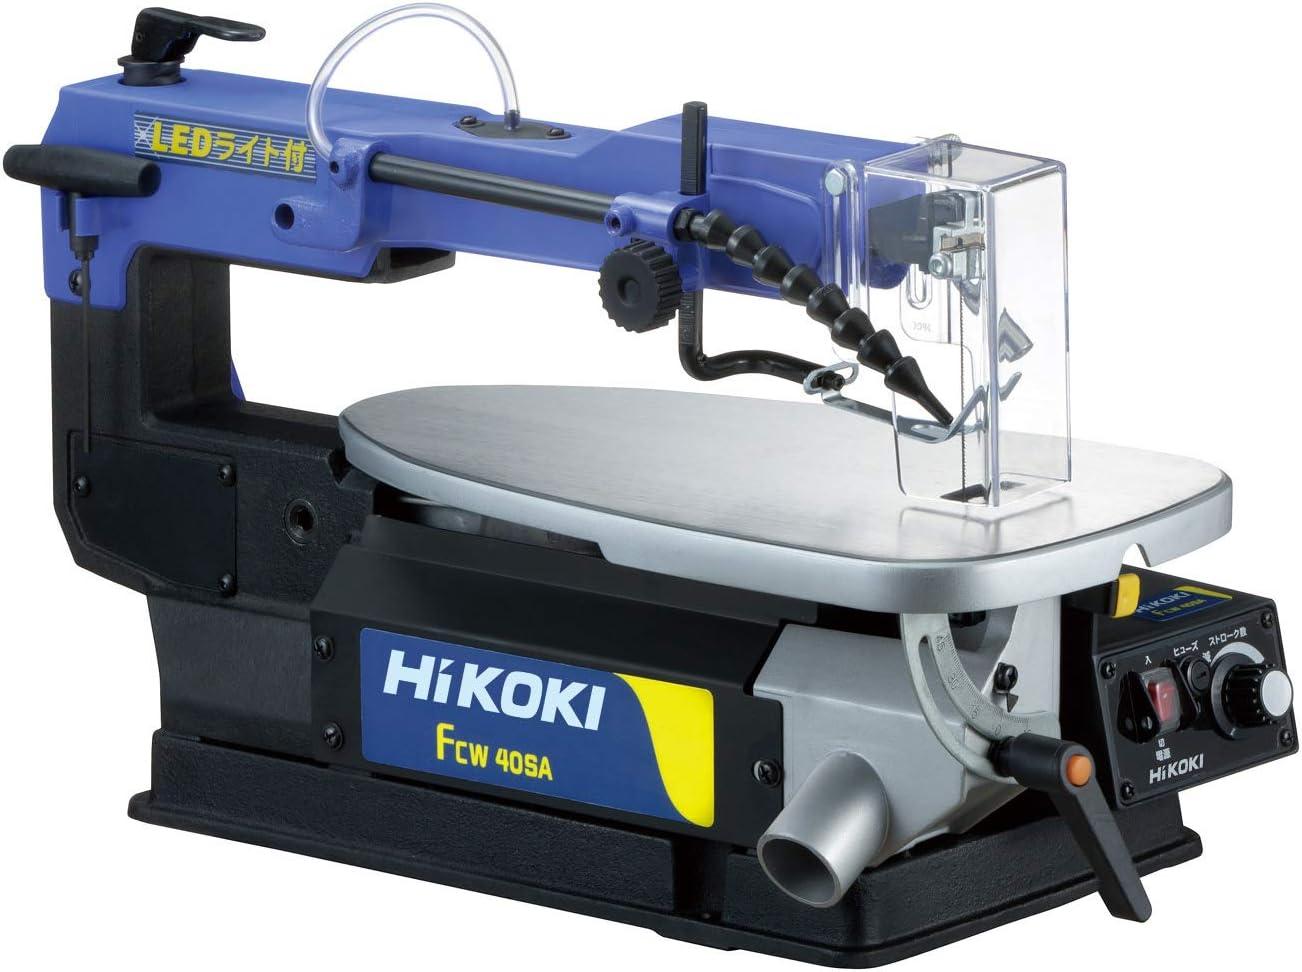 HiKOKI(ハイコーキ) 旧日立工機 卓上糸のこ盤